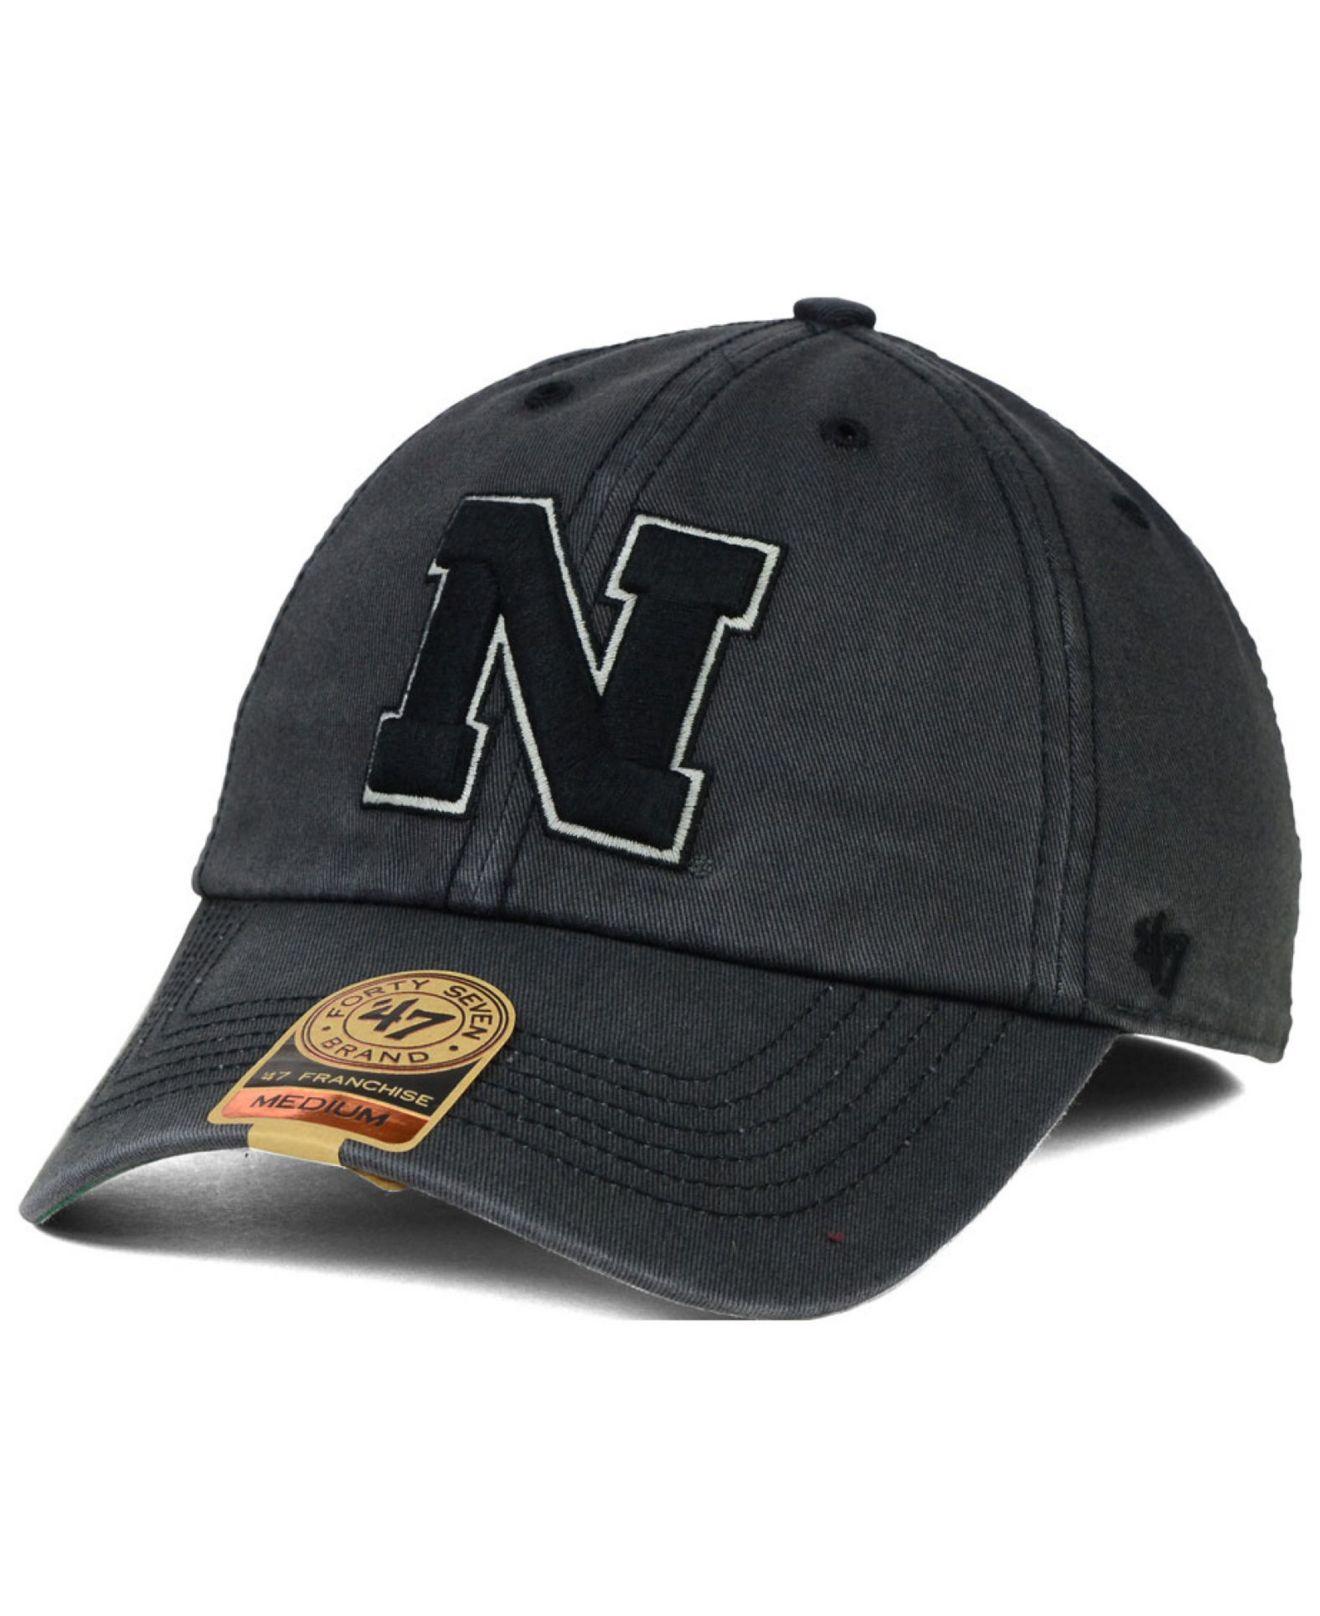 super popular b0ef5 8030c ... closeout lyst 47 brand nebraska cornhuskers sachem cap in gray for men  5d539 ba6fd